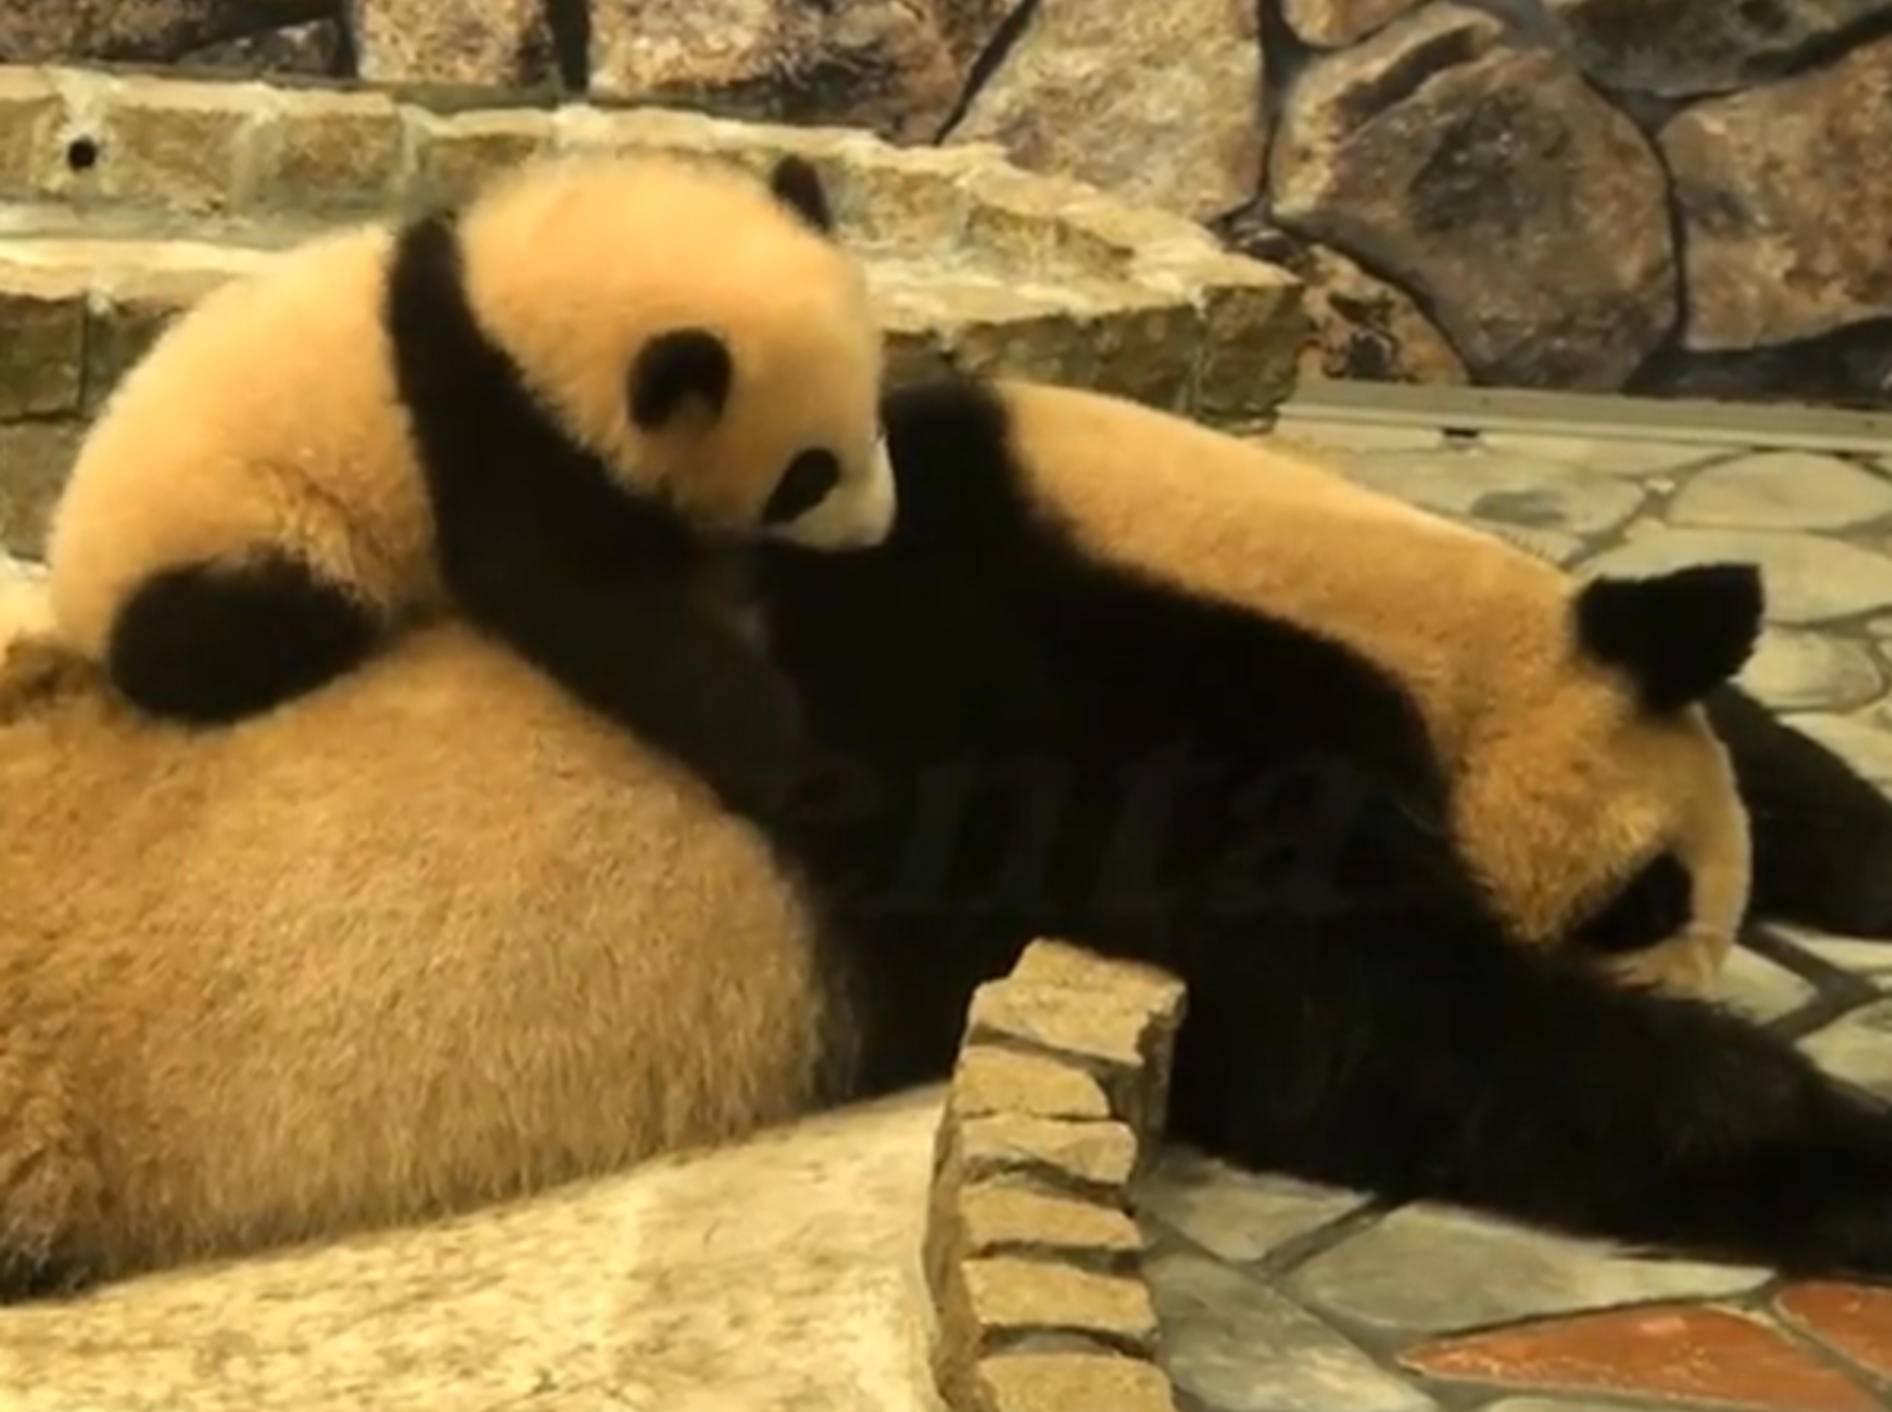 Pandababy-Mutter-aufwecken-rumturnen